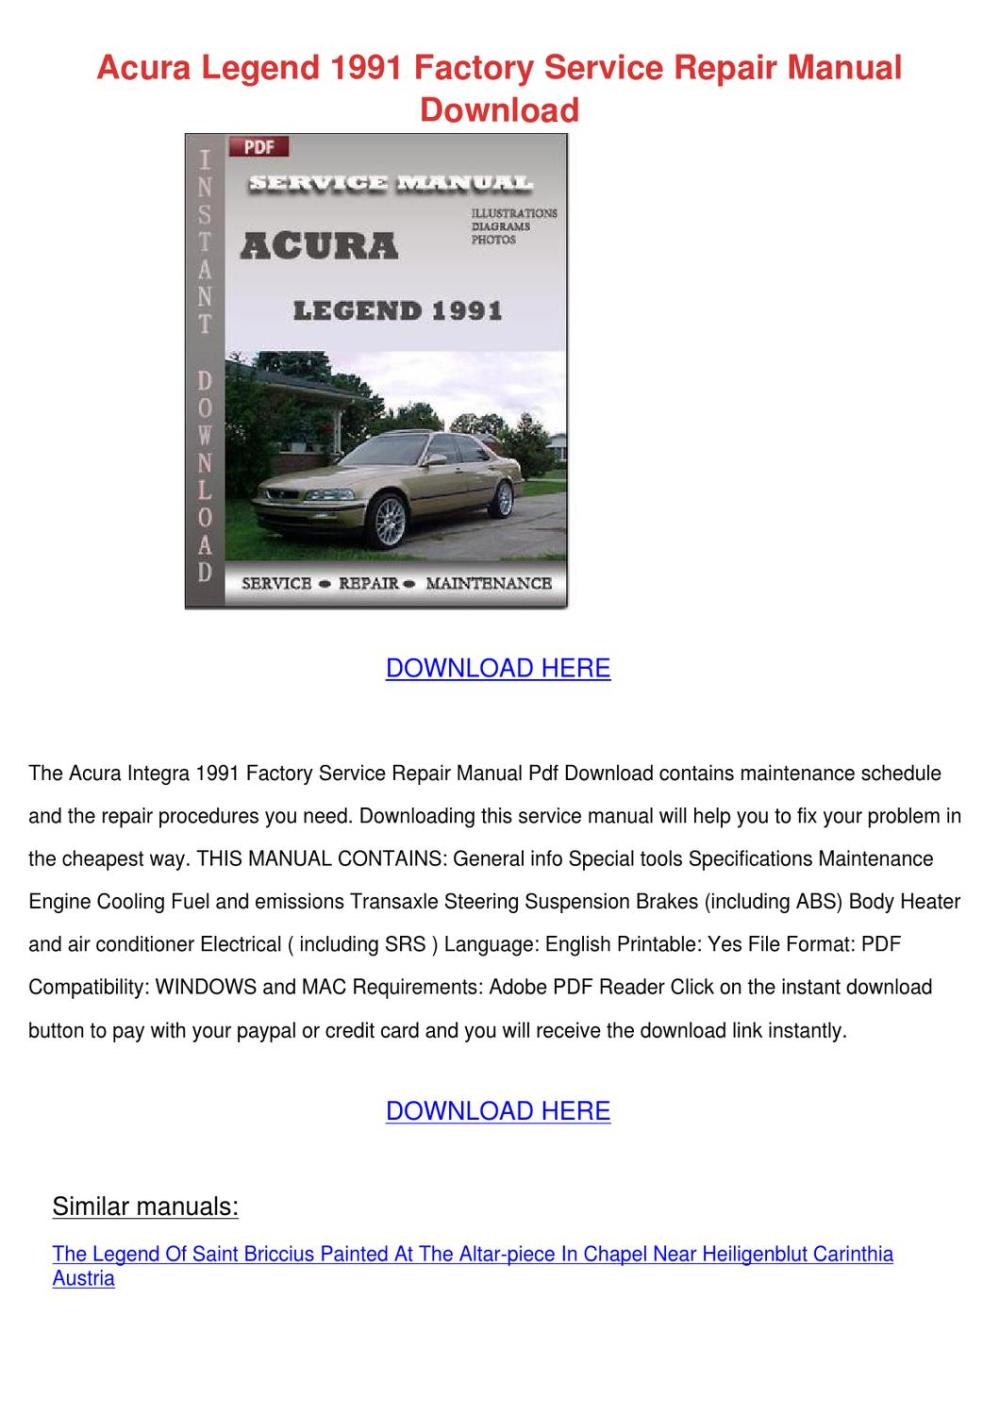 medium resolution of acura legend 1991 factory service repair manu